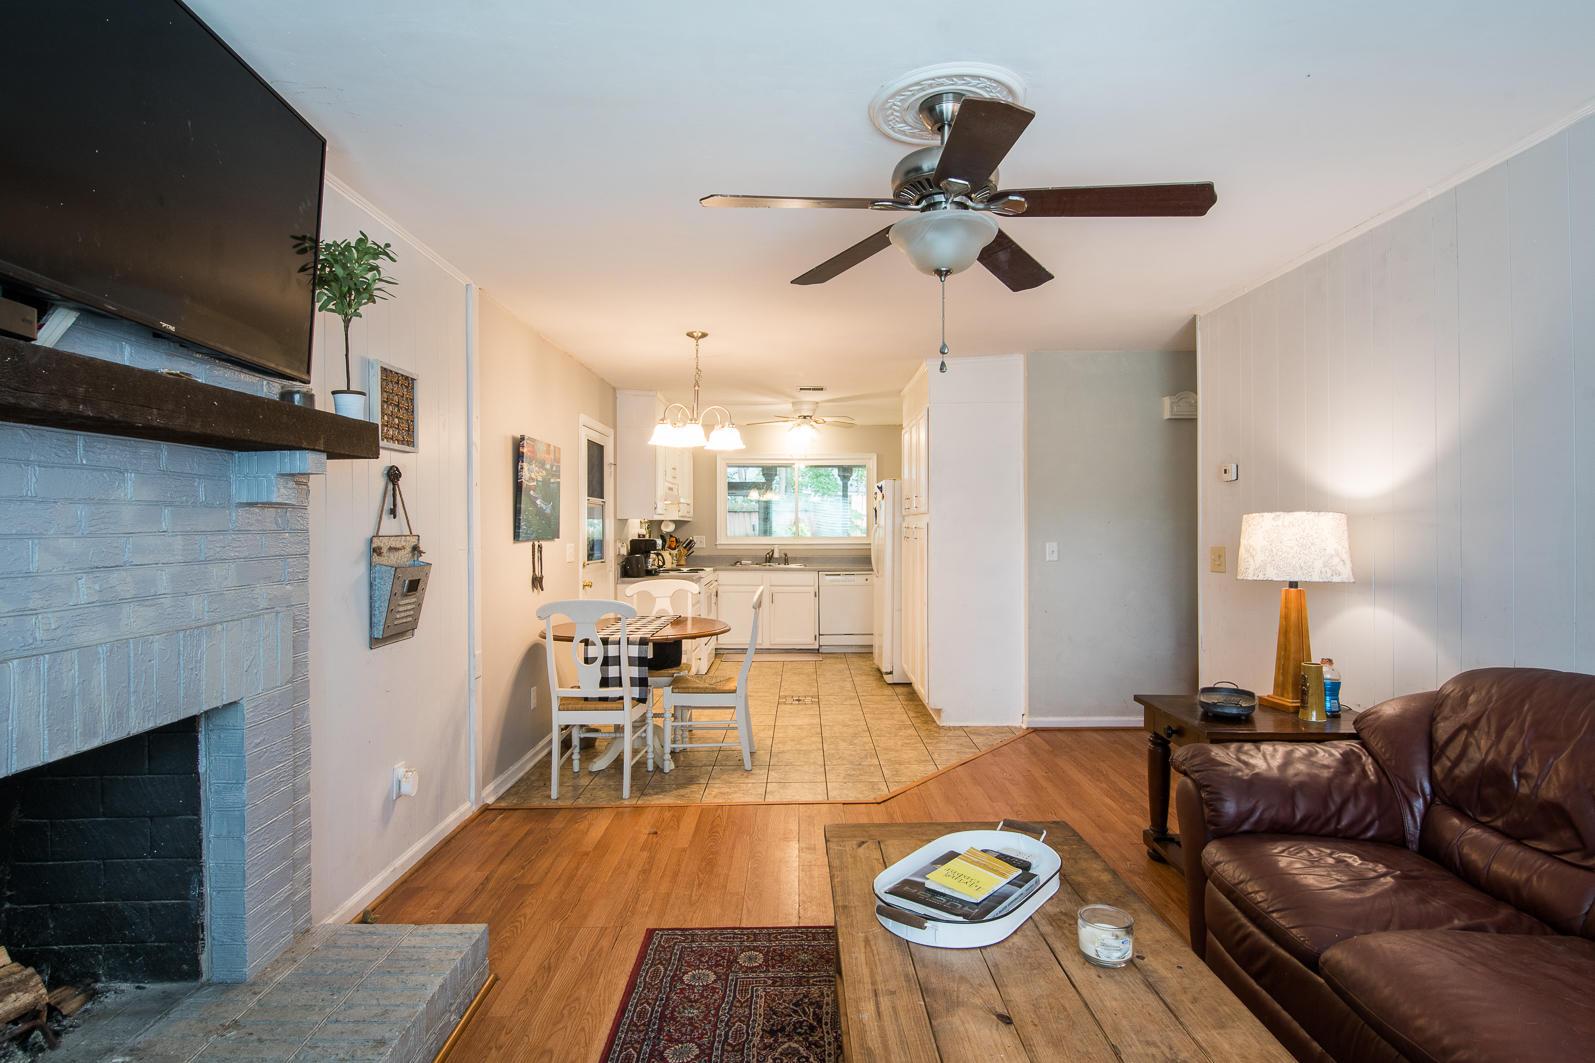 Wando East Homes For Sale - 1605 Babington, Mount Pleasant, SC - 26